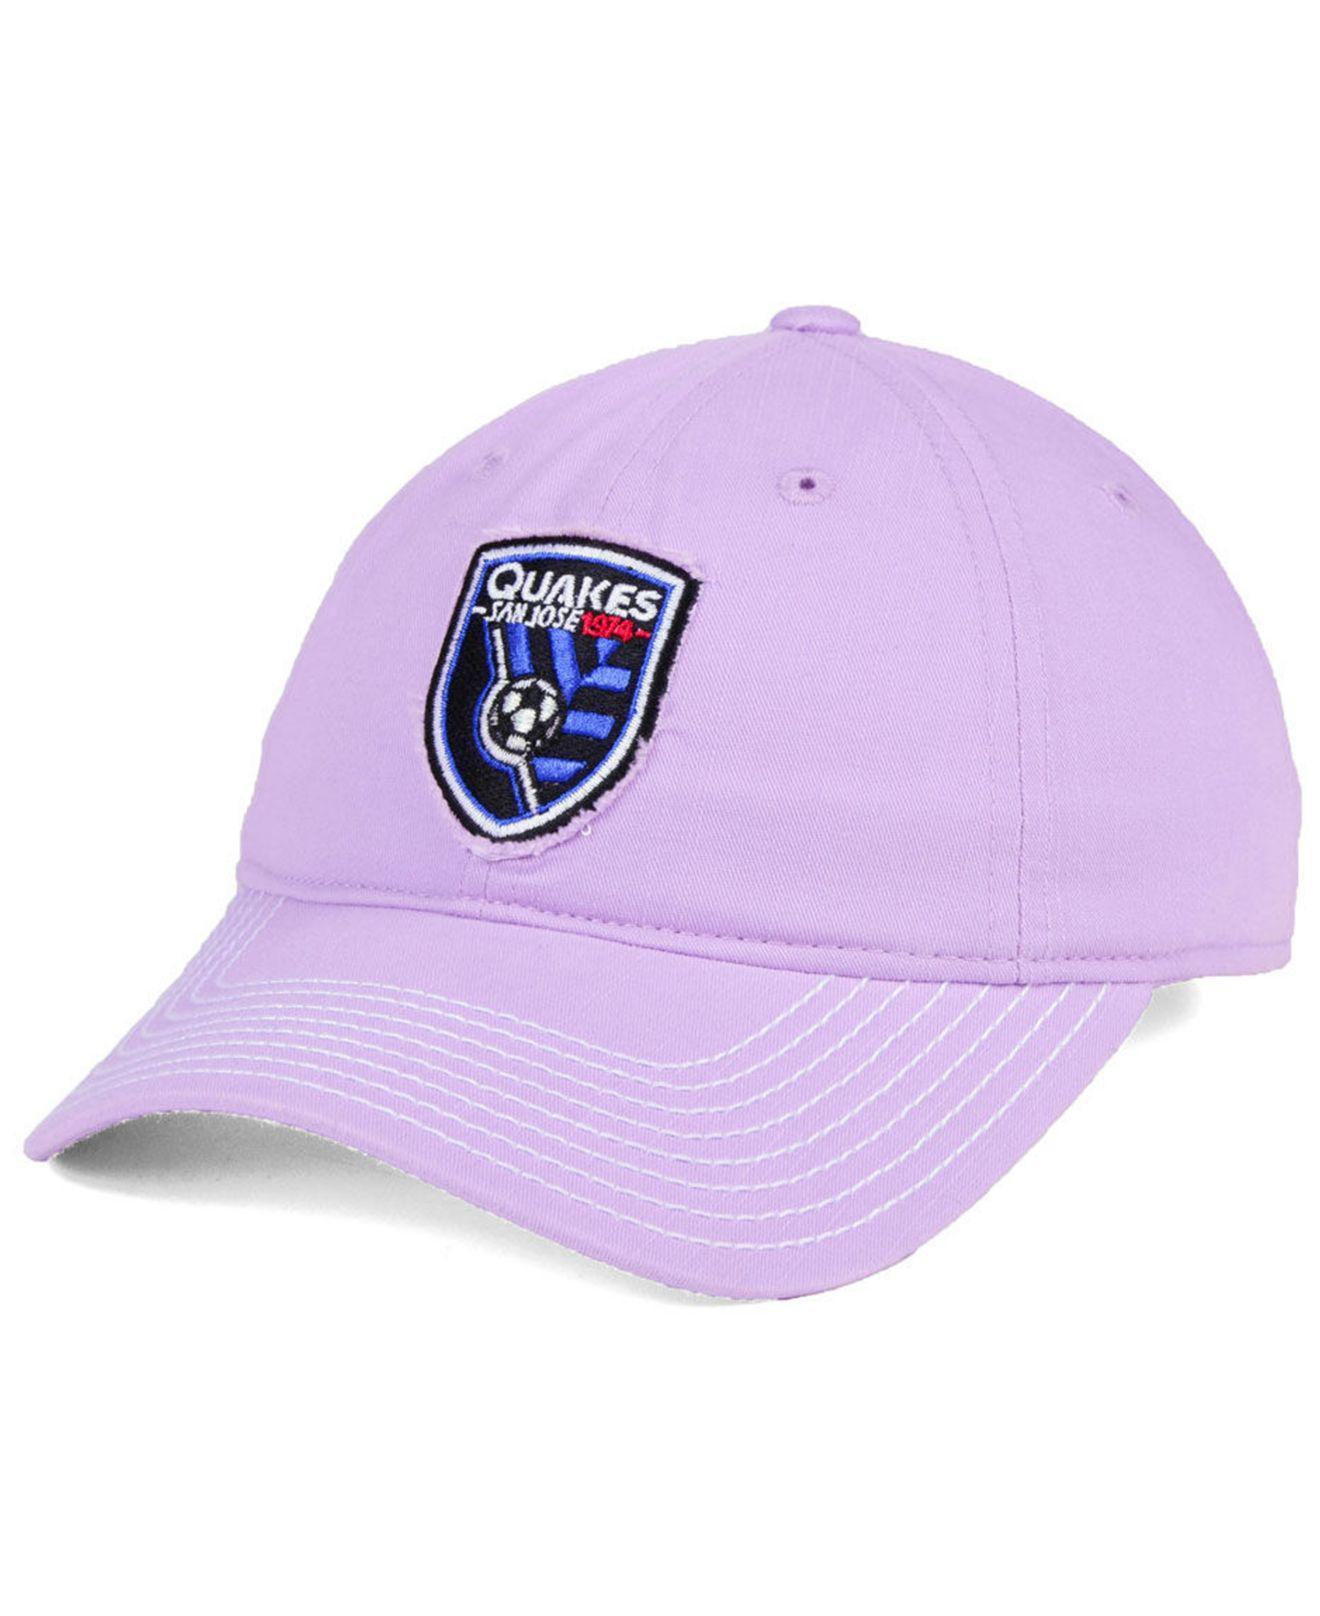 super popular 8f0c9 25987 ... australia adidas. womens purple san jose earthquakes pink slouch cap  cc5d3 cb679